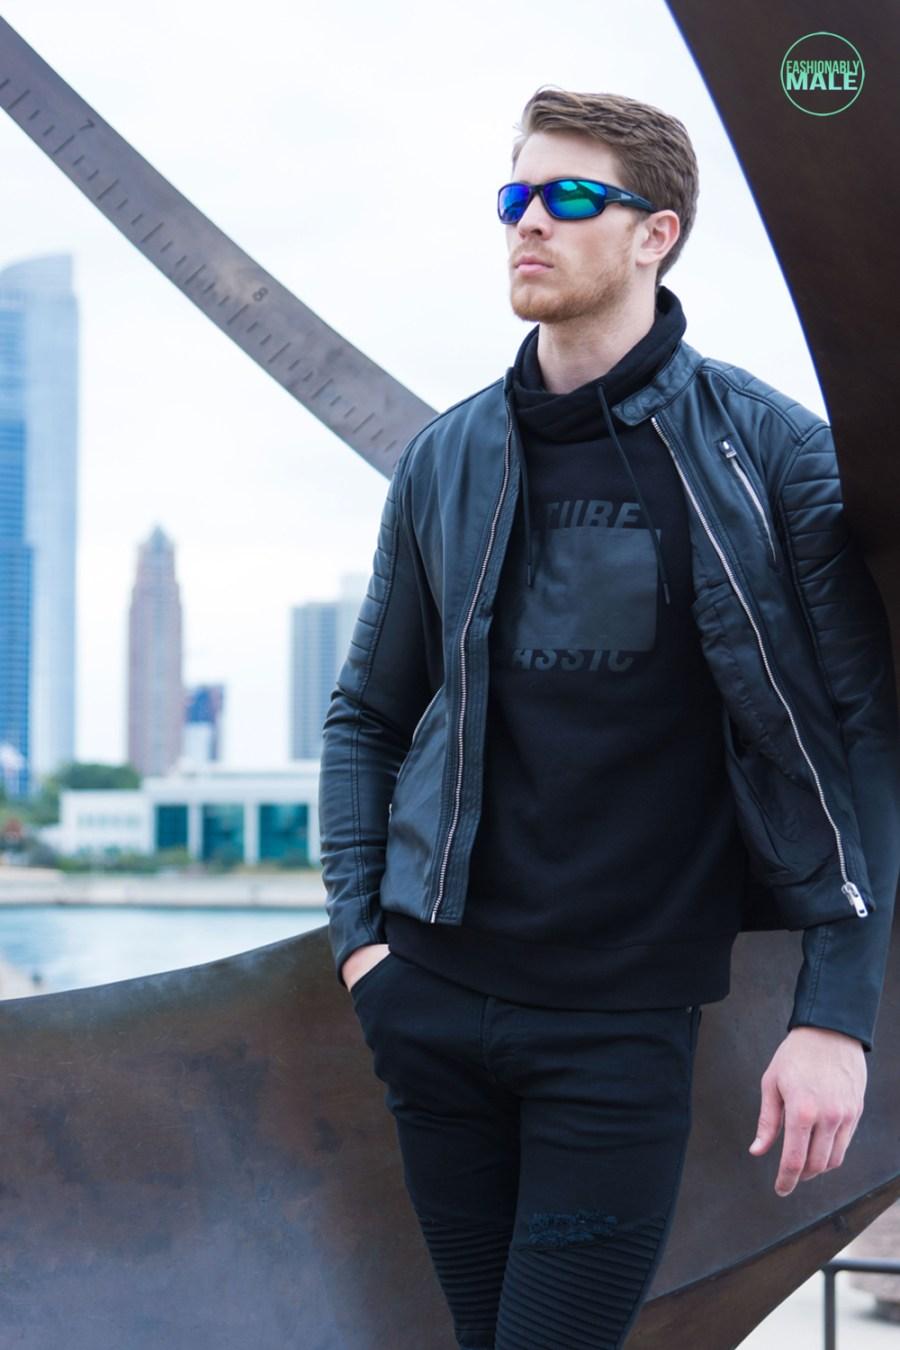 Matthew Mason for Fashionably Male (9)